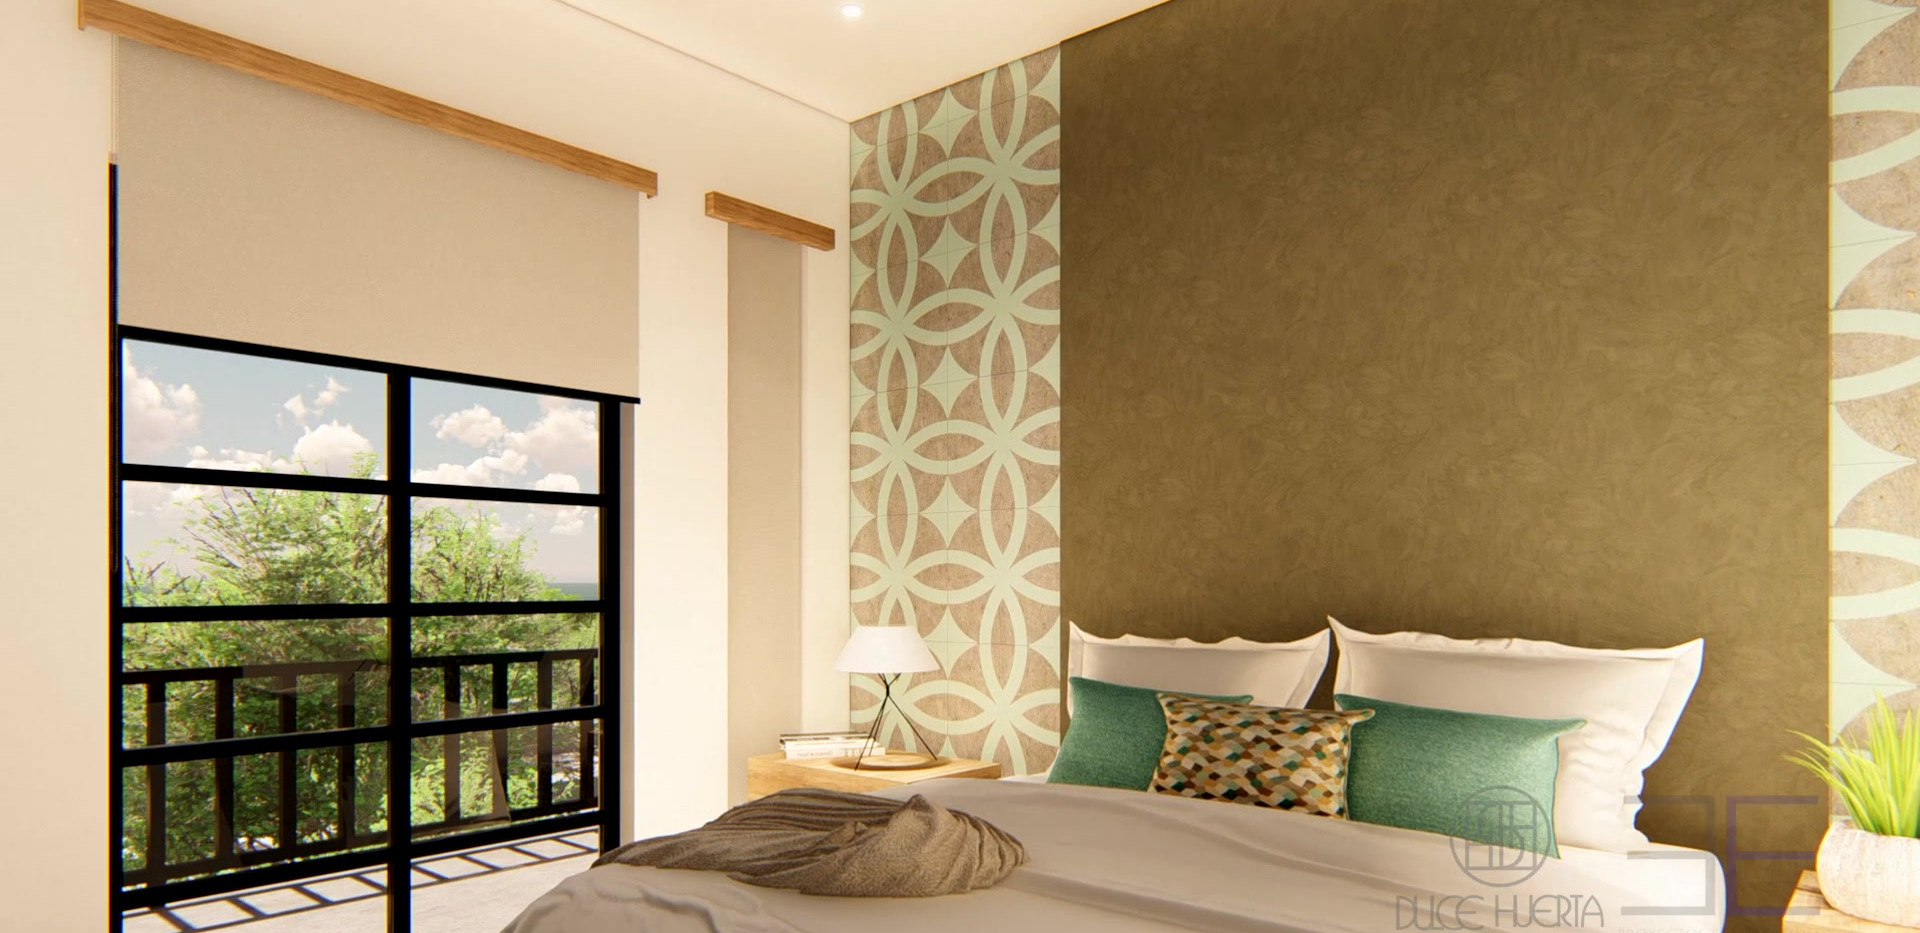 Hotel Belisario 1920x1080.m4v